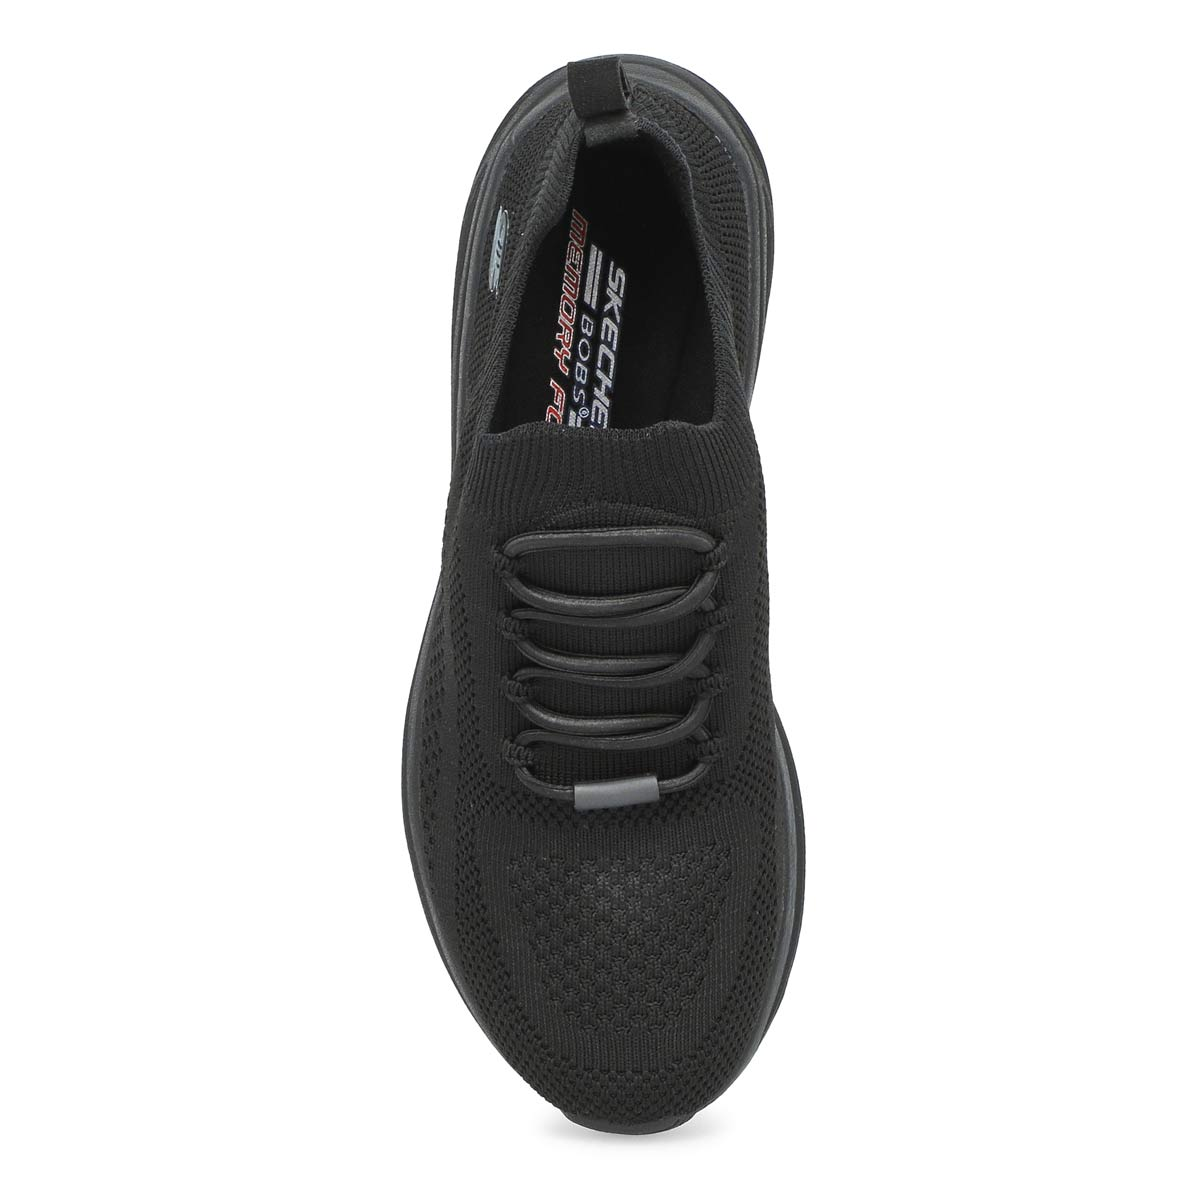 Women's Bobs Sparrow 2.0 Sneaker - Black